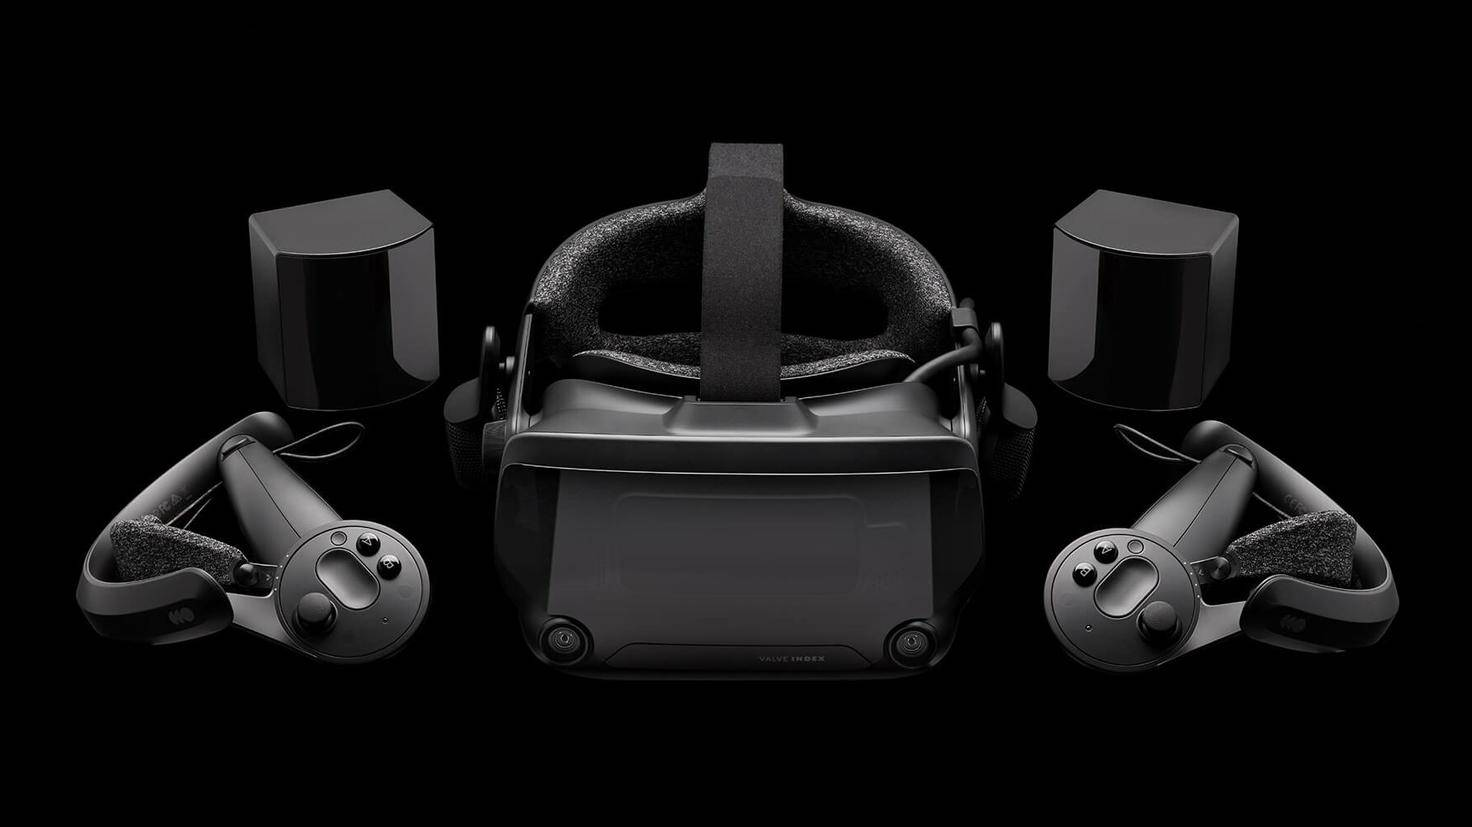 Valve-Index-VR-Headset